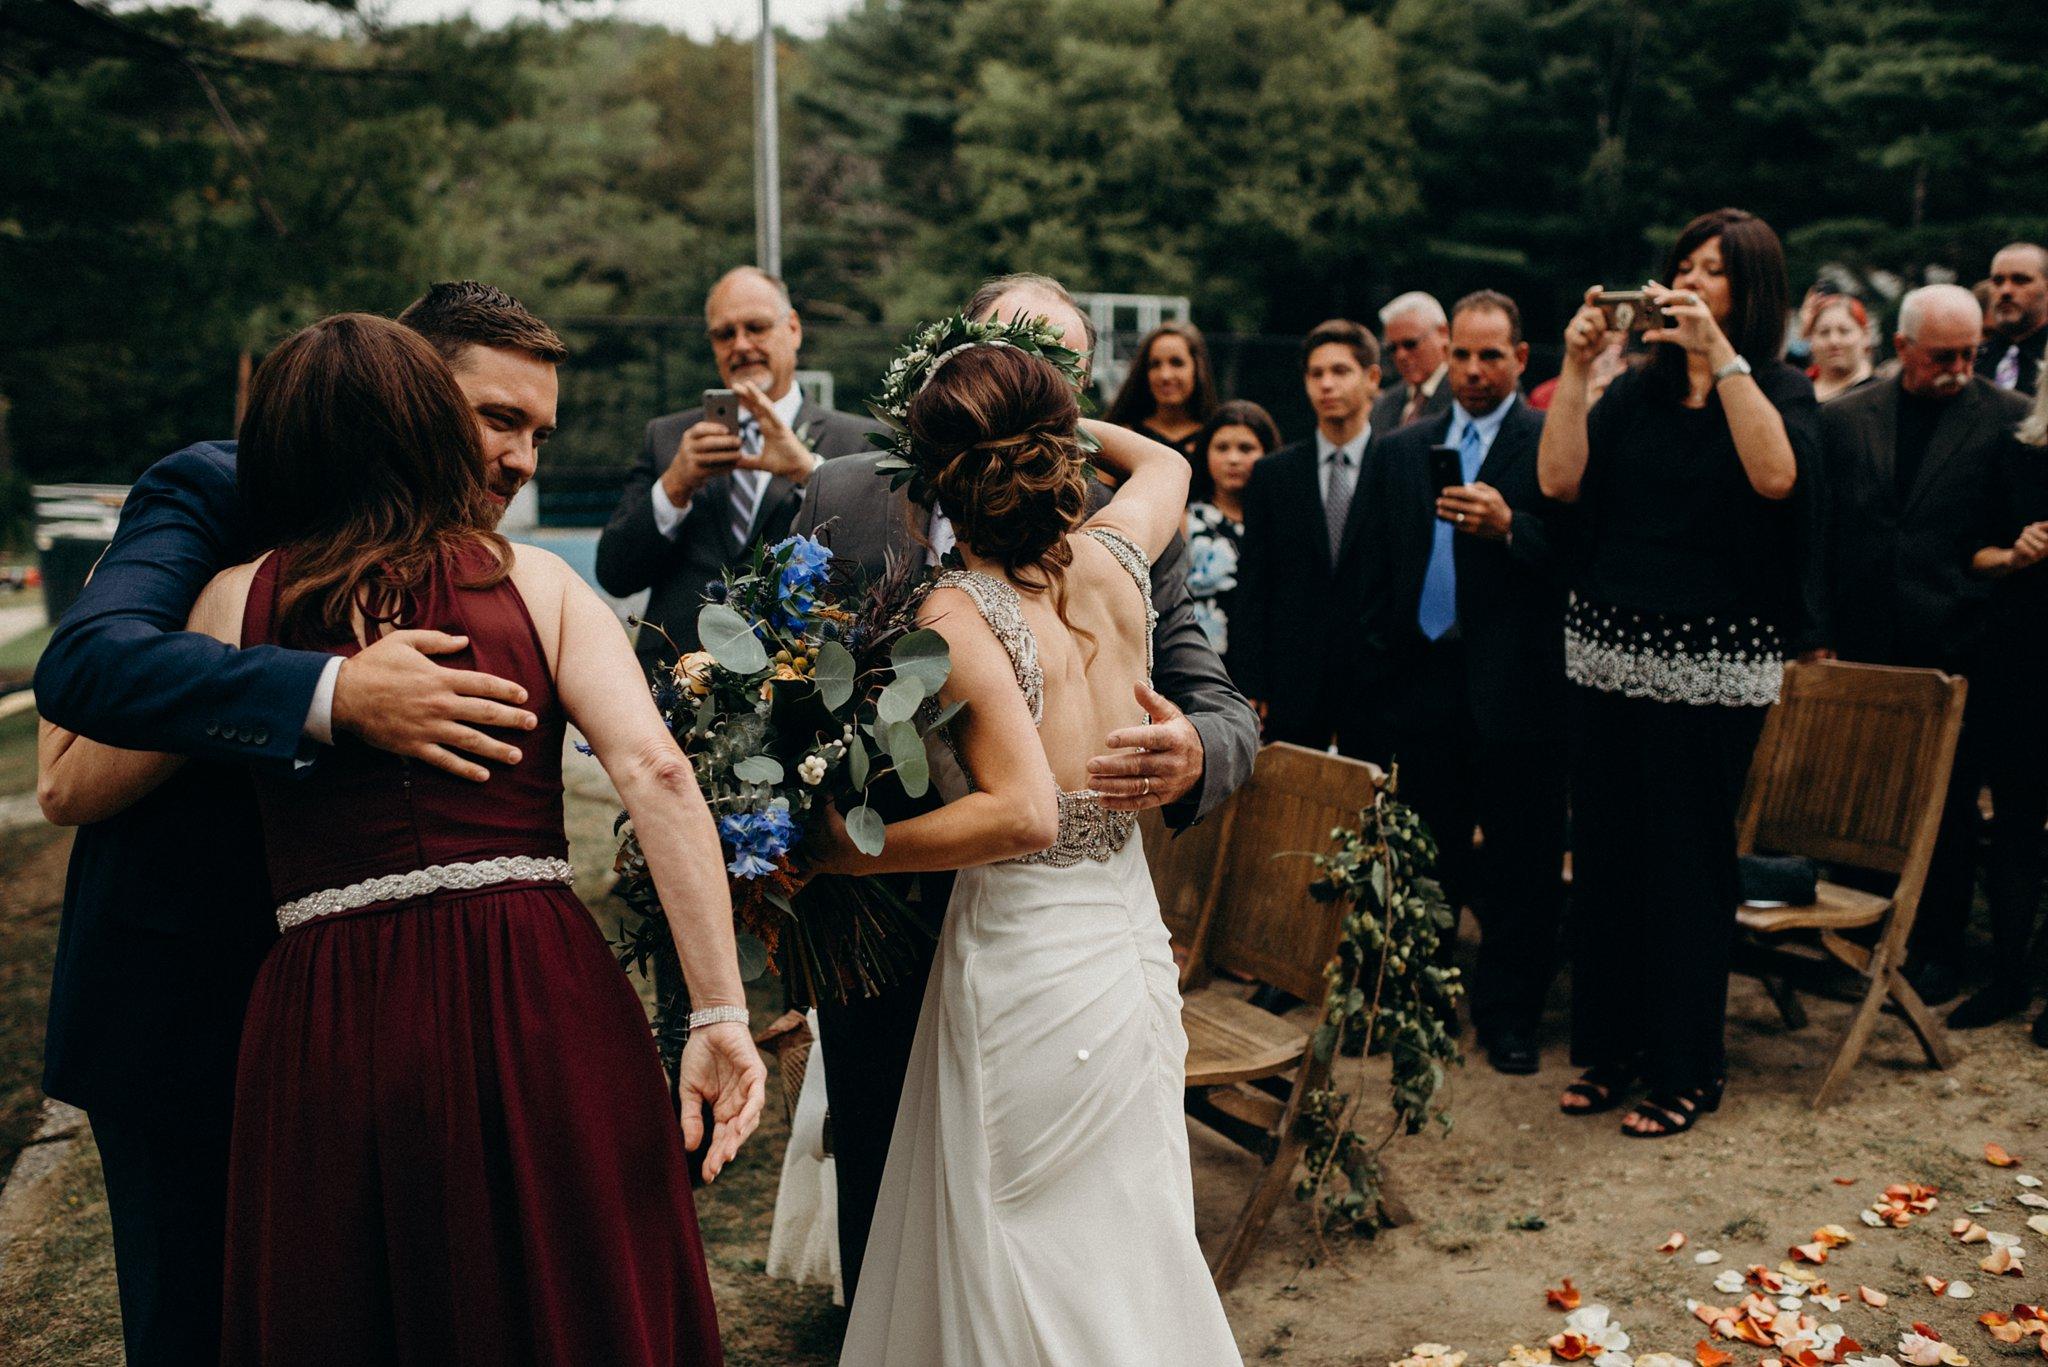 kaihla_tonai_intimate_wedding_elopement_photographer_6625.jpg